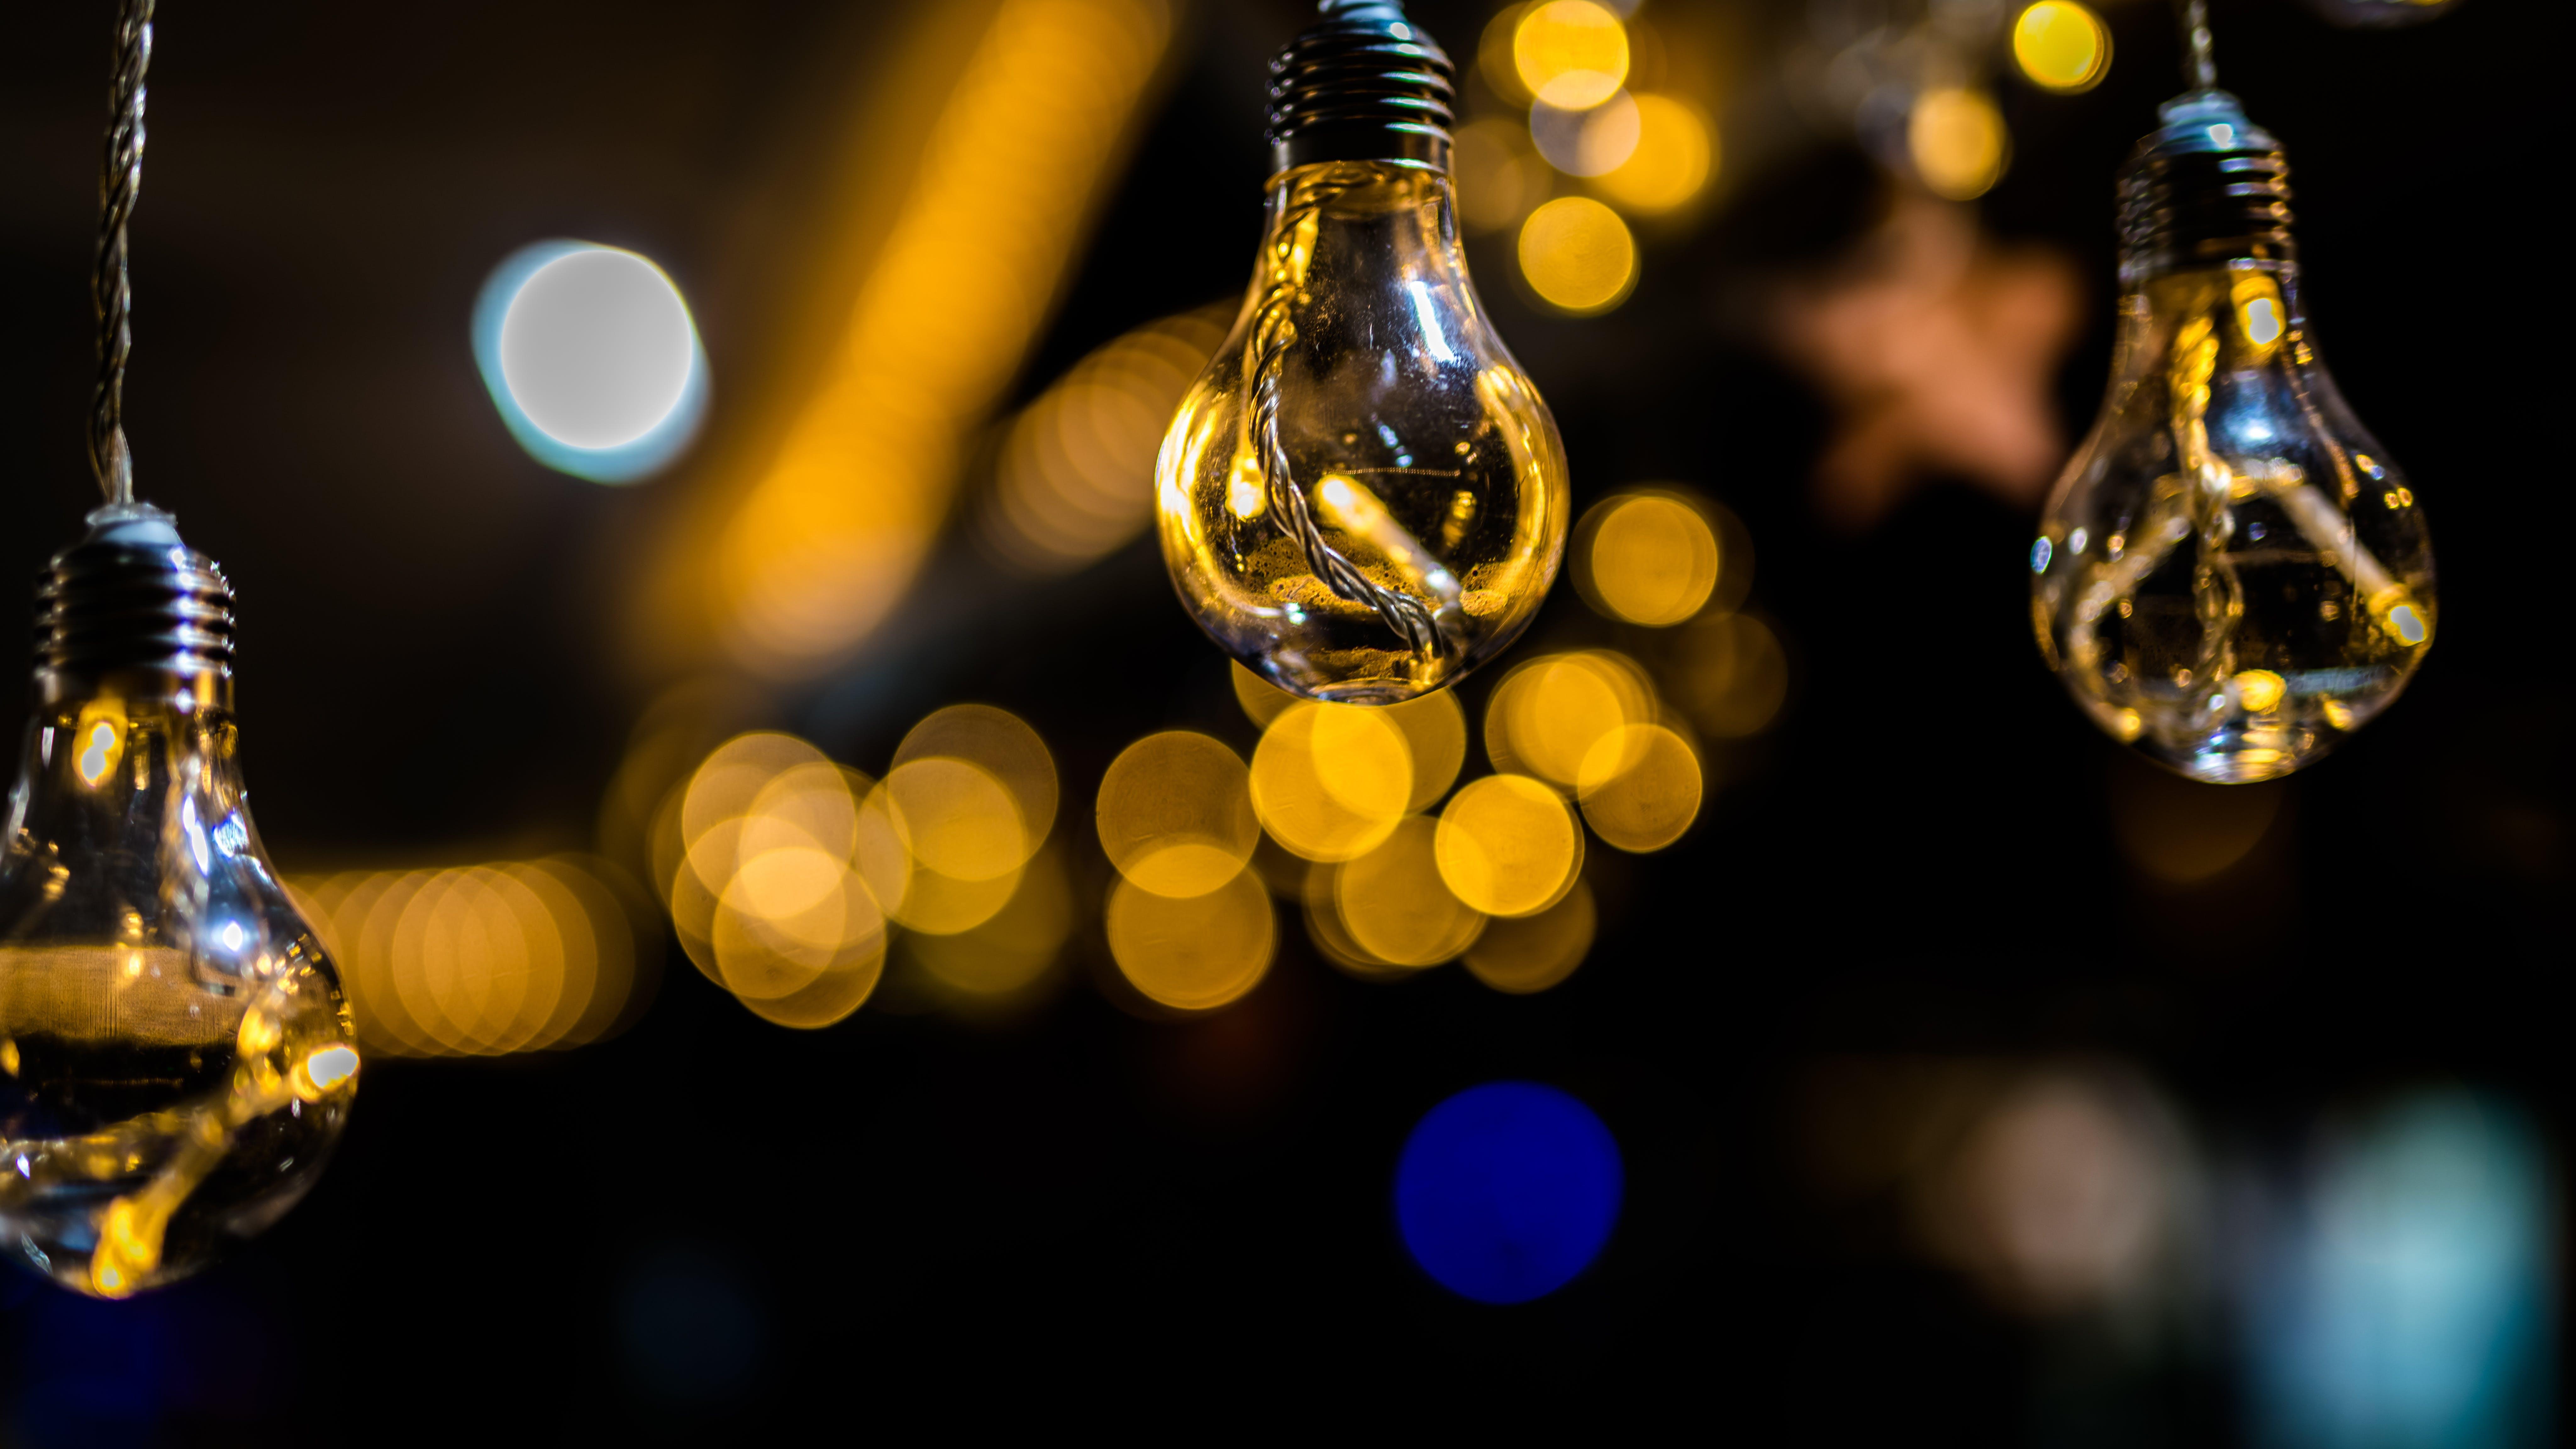 Close-Up Photo of Three Hanging Light Bulbs